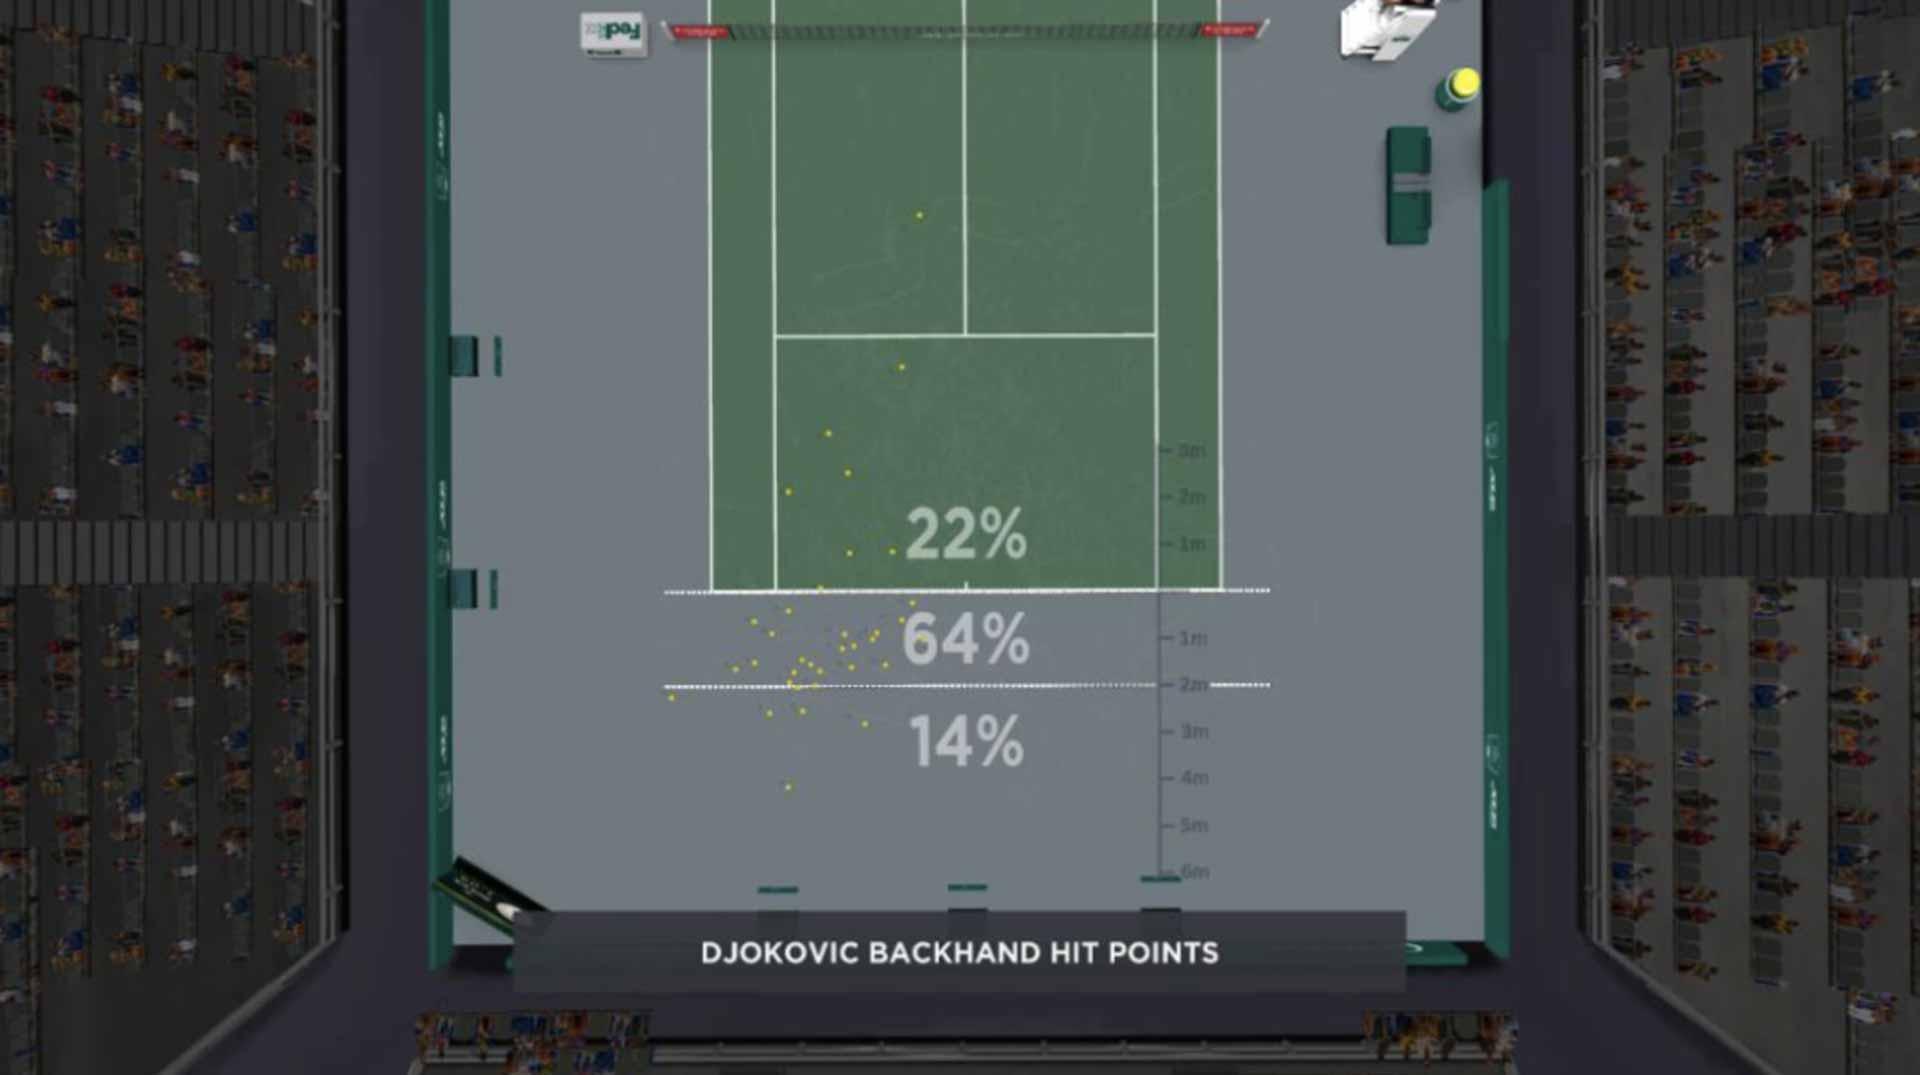 Djokovic Backhand Placement